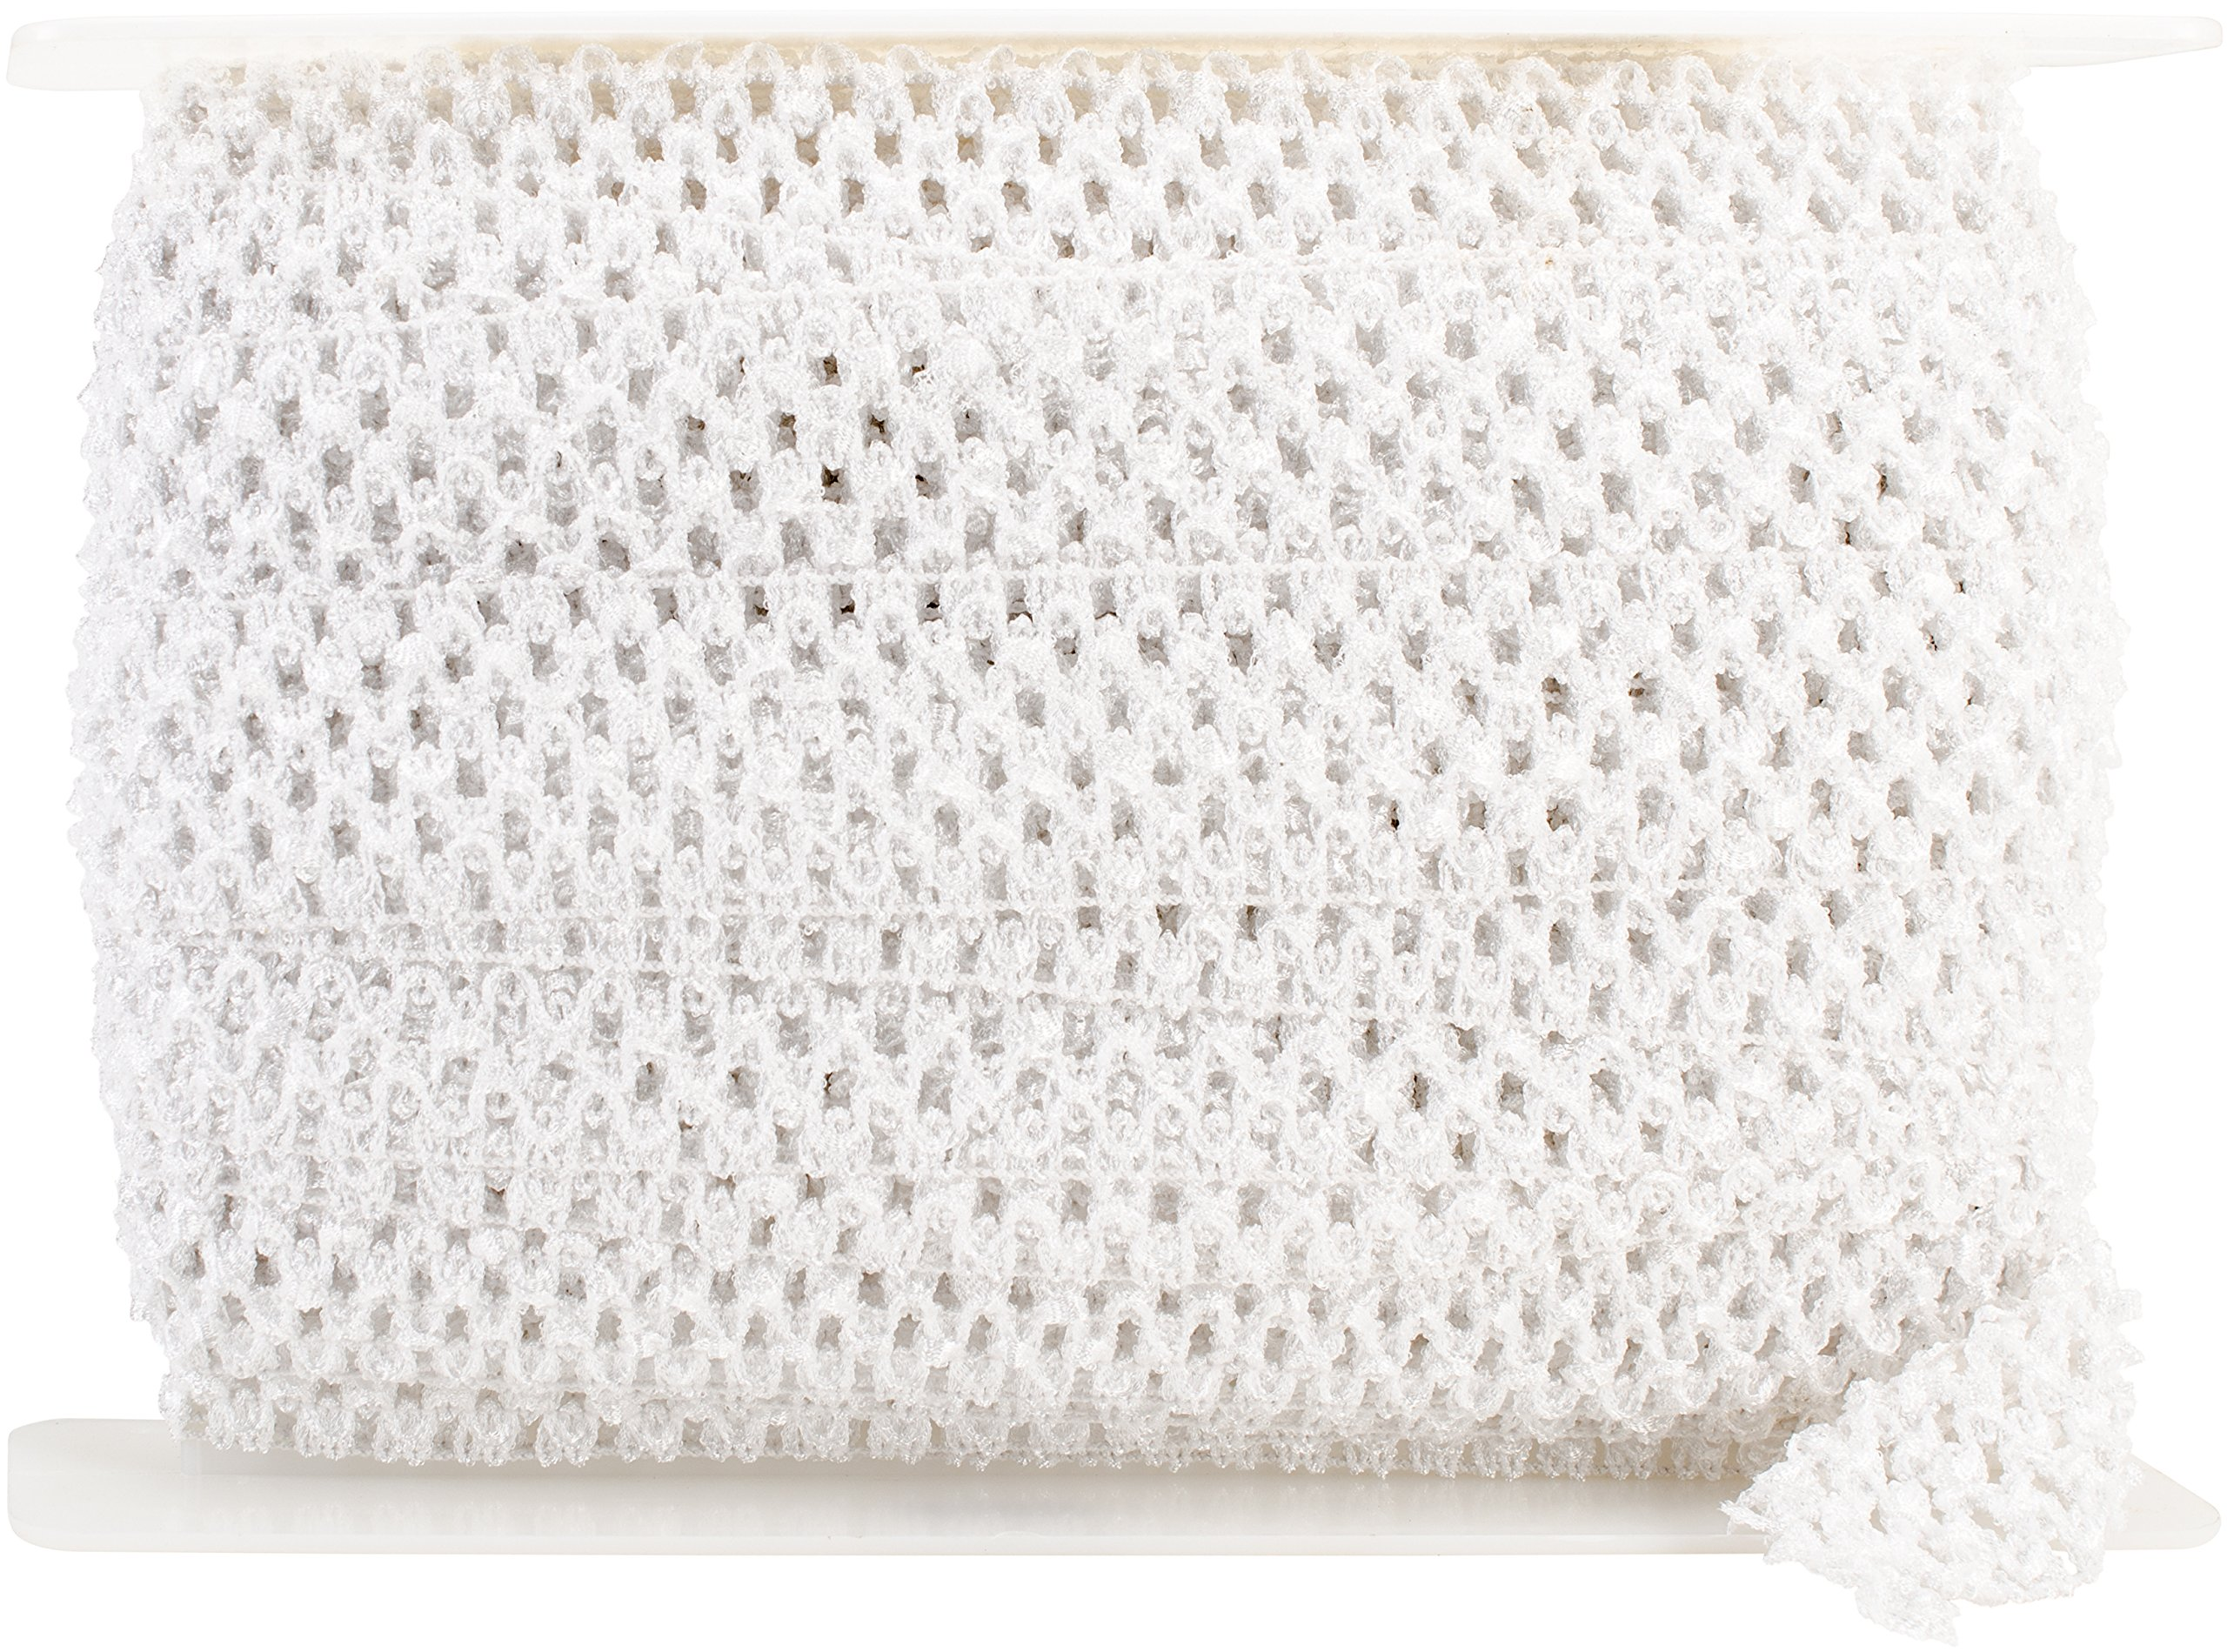 Expo IR7005-WH 20-Yard Crochet Headband Stretch Trim, 1-3/4-Inch, White by Expo